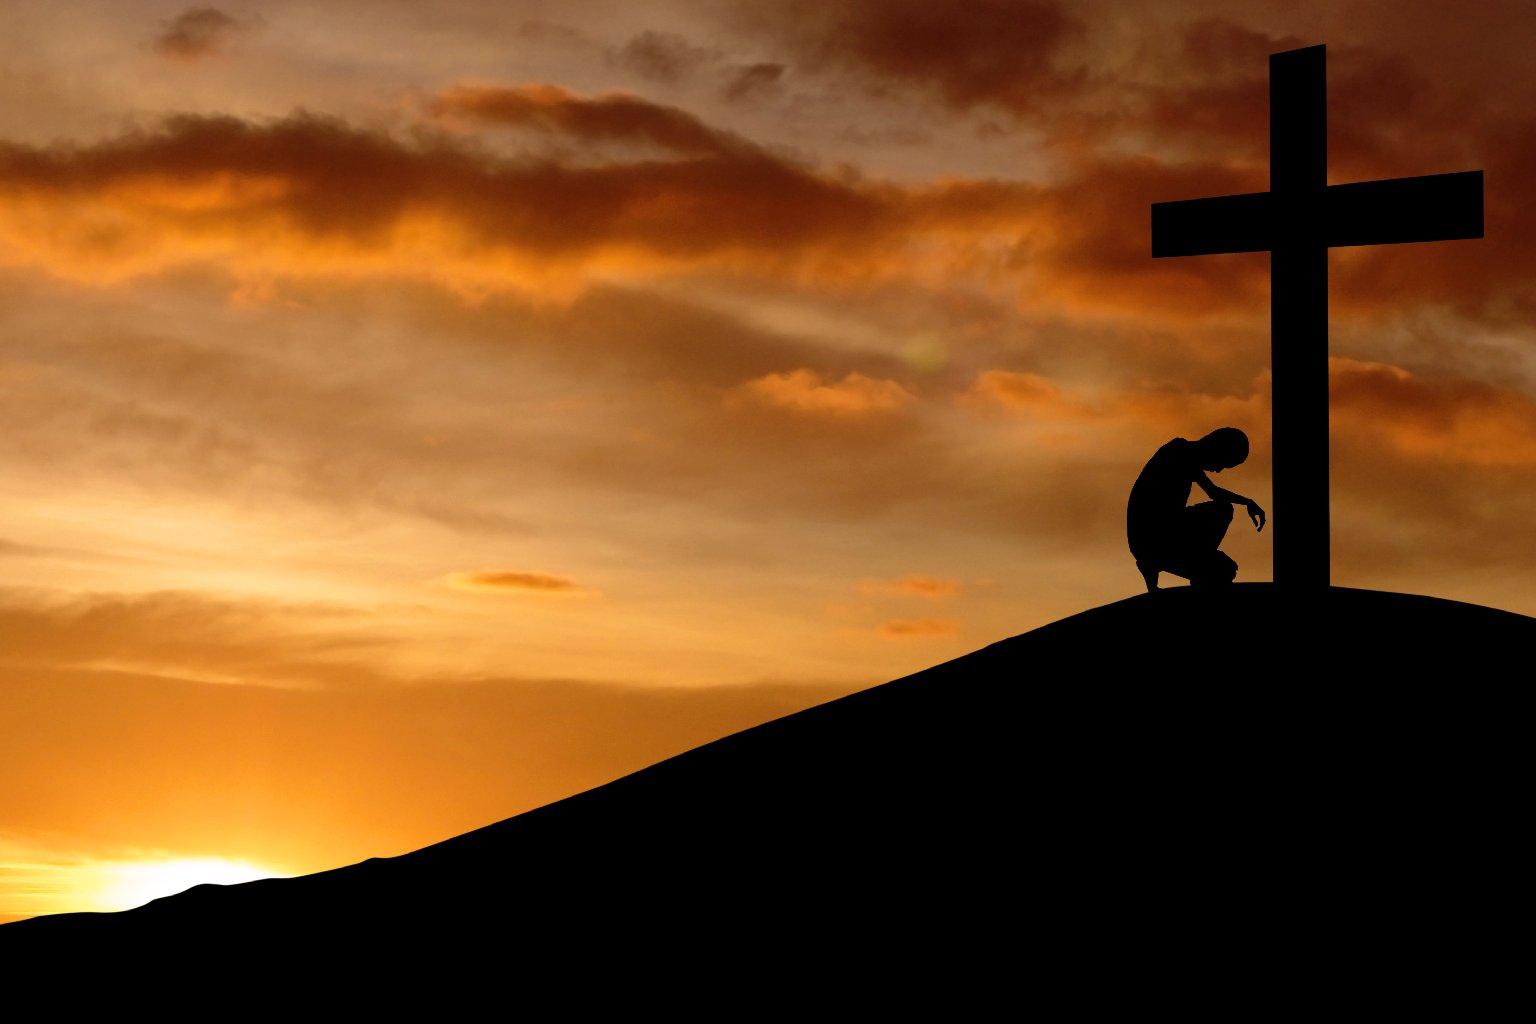 bigstock-christian-background-confess-31452830.jpg